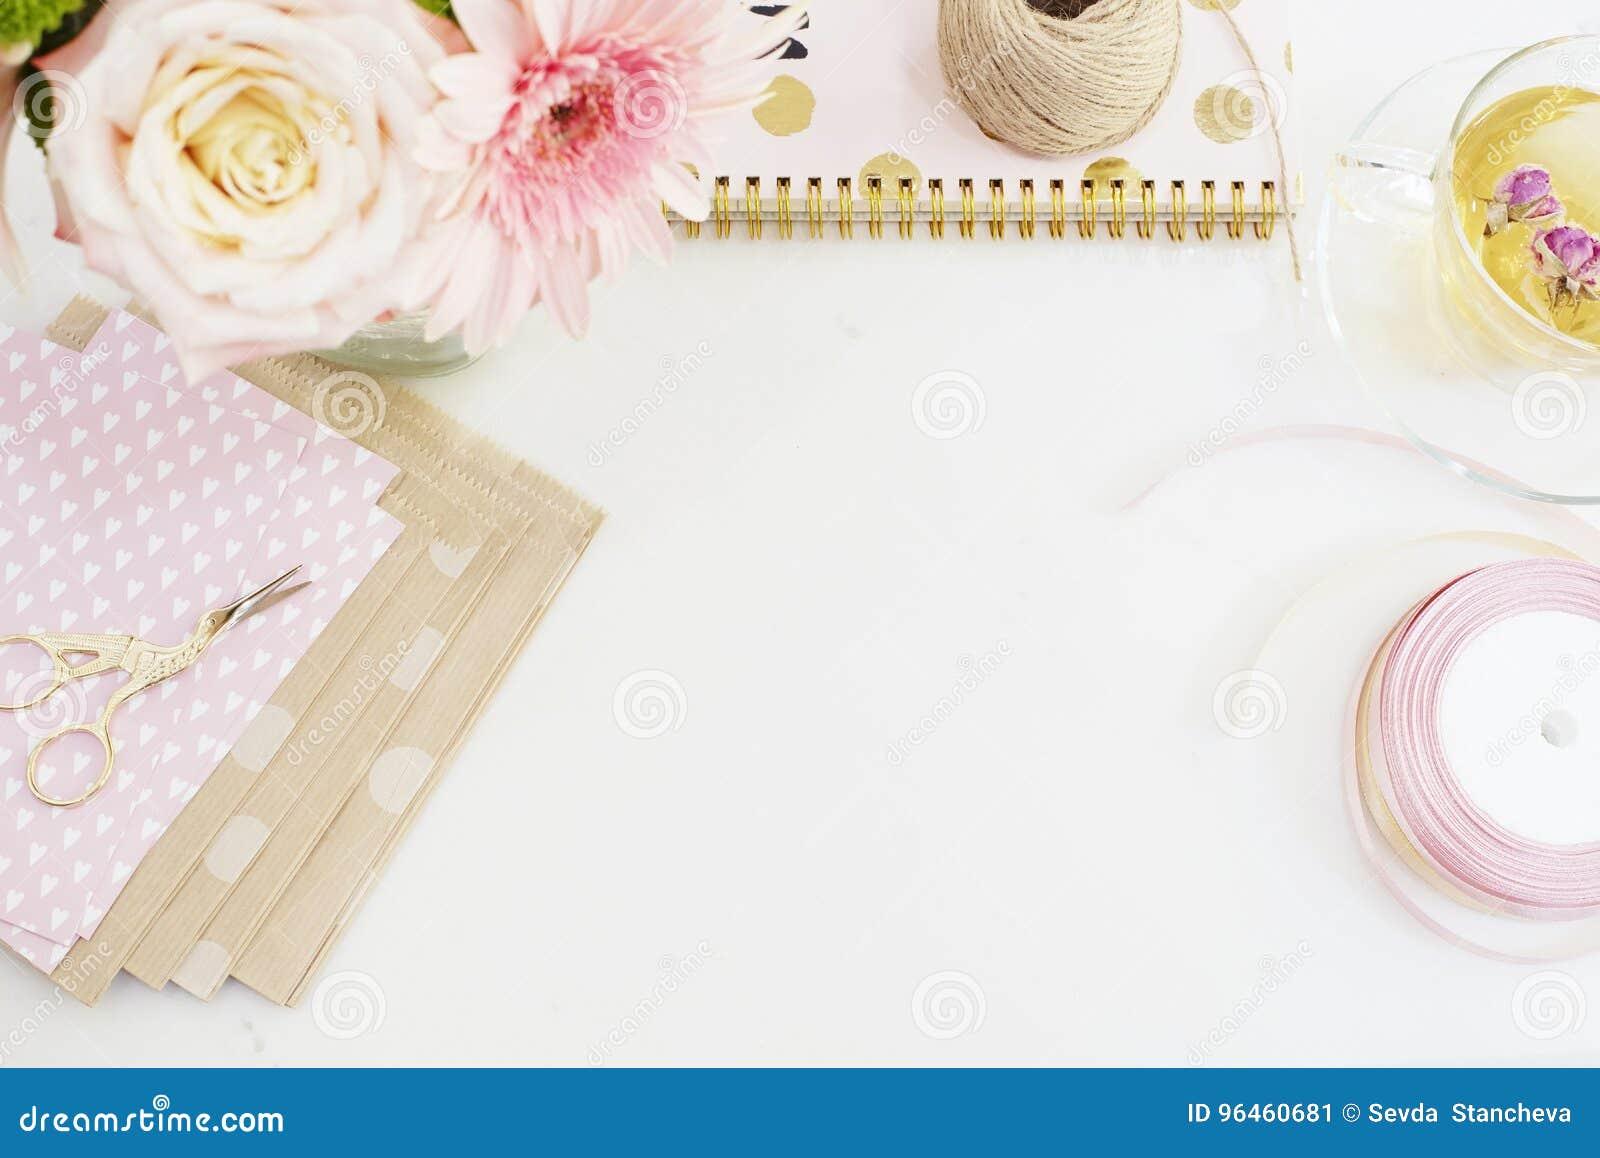 Handmade, craft concept. Handmade goods for packaging - twine, ribbons. Feminine workplace concept. Freelance fashion femininity w